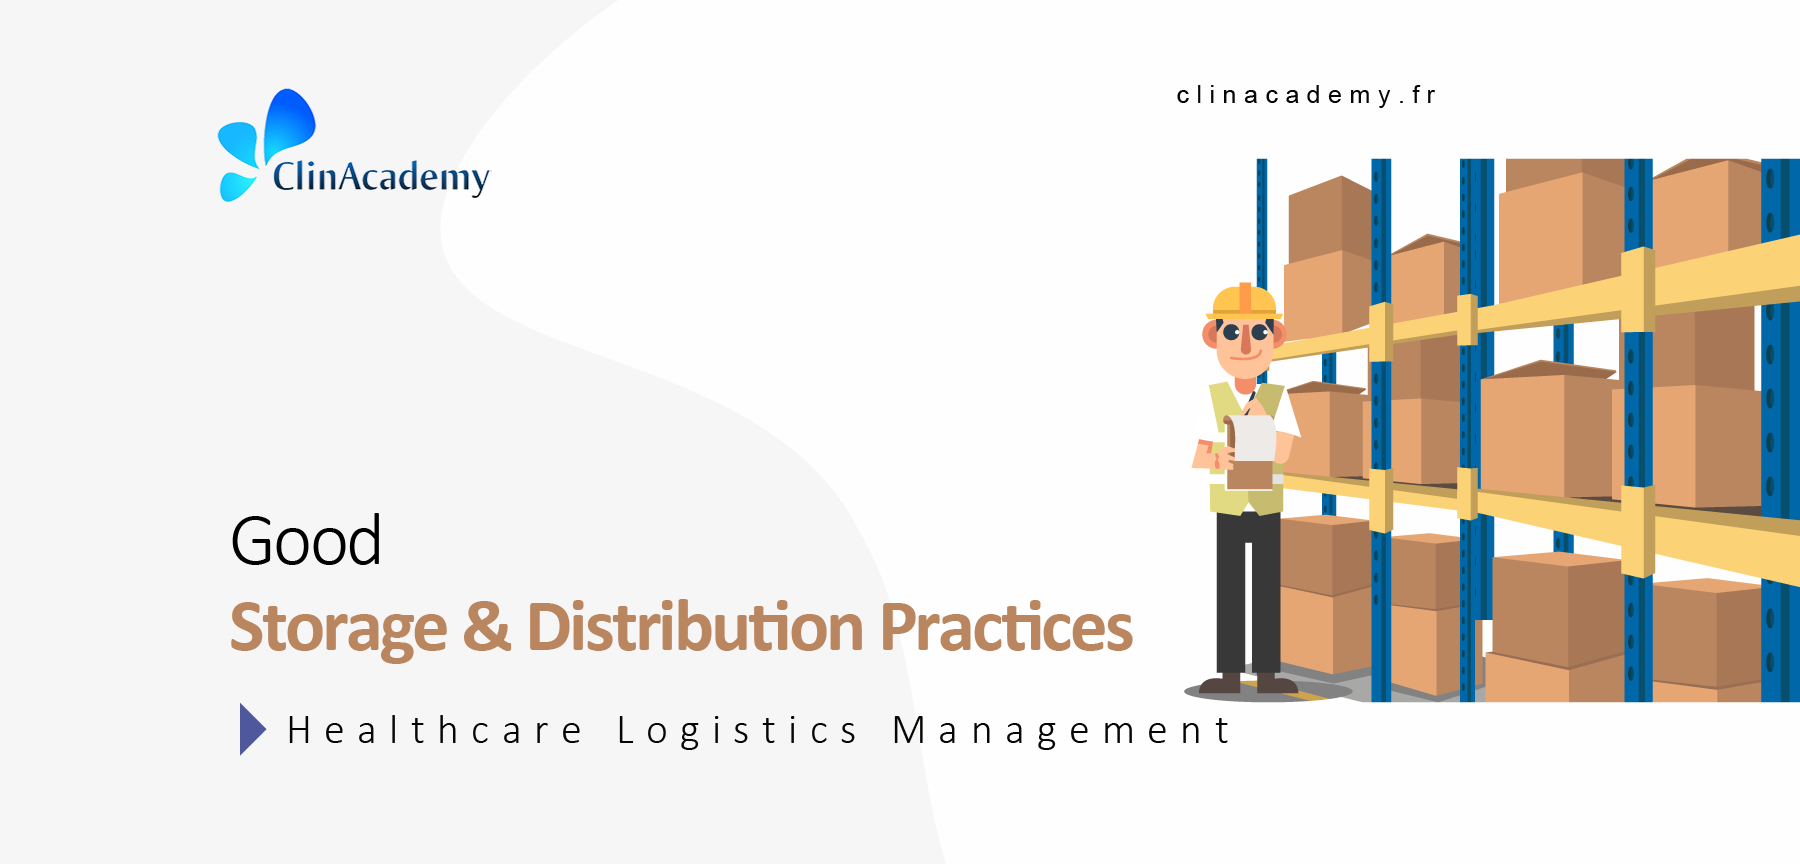 Good Storage & Distribution Practices